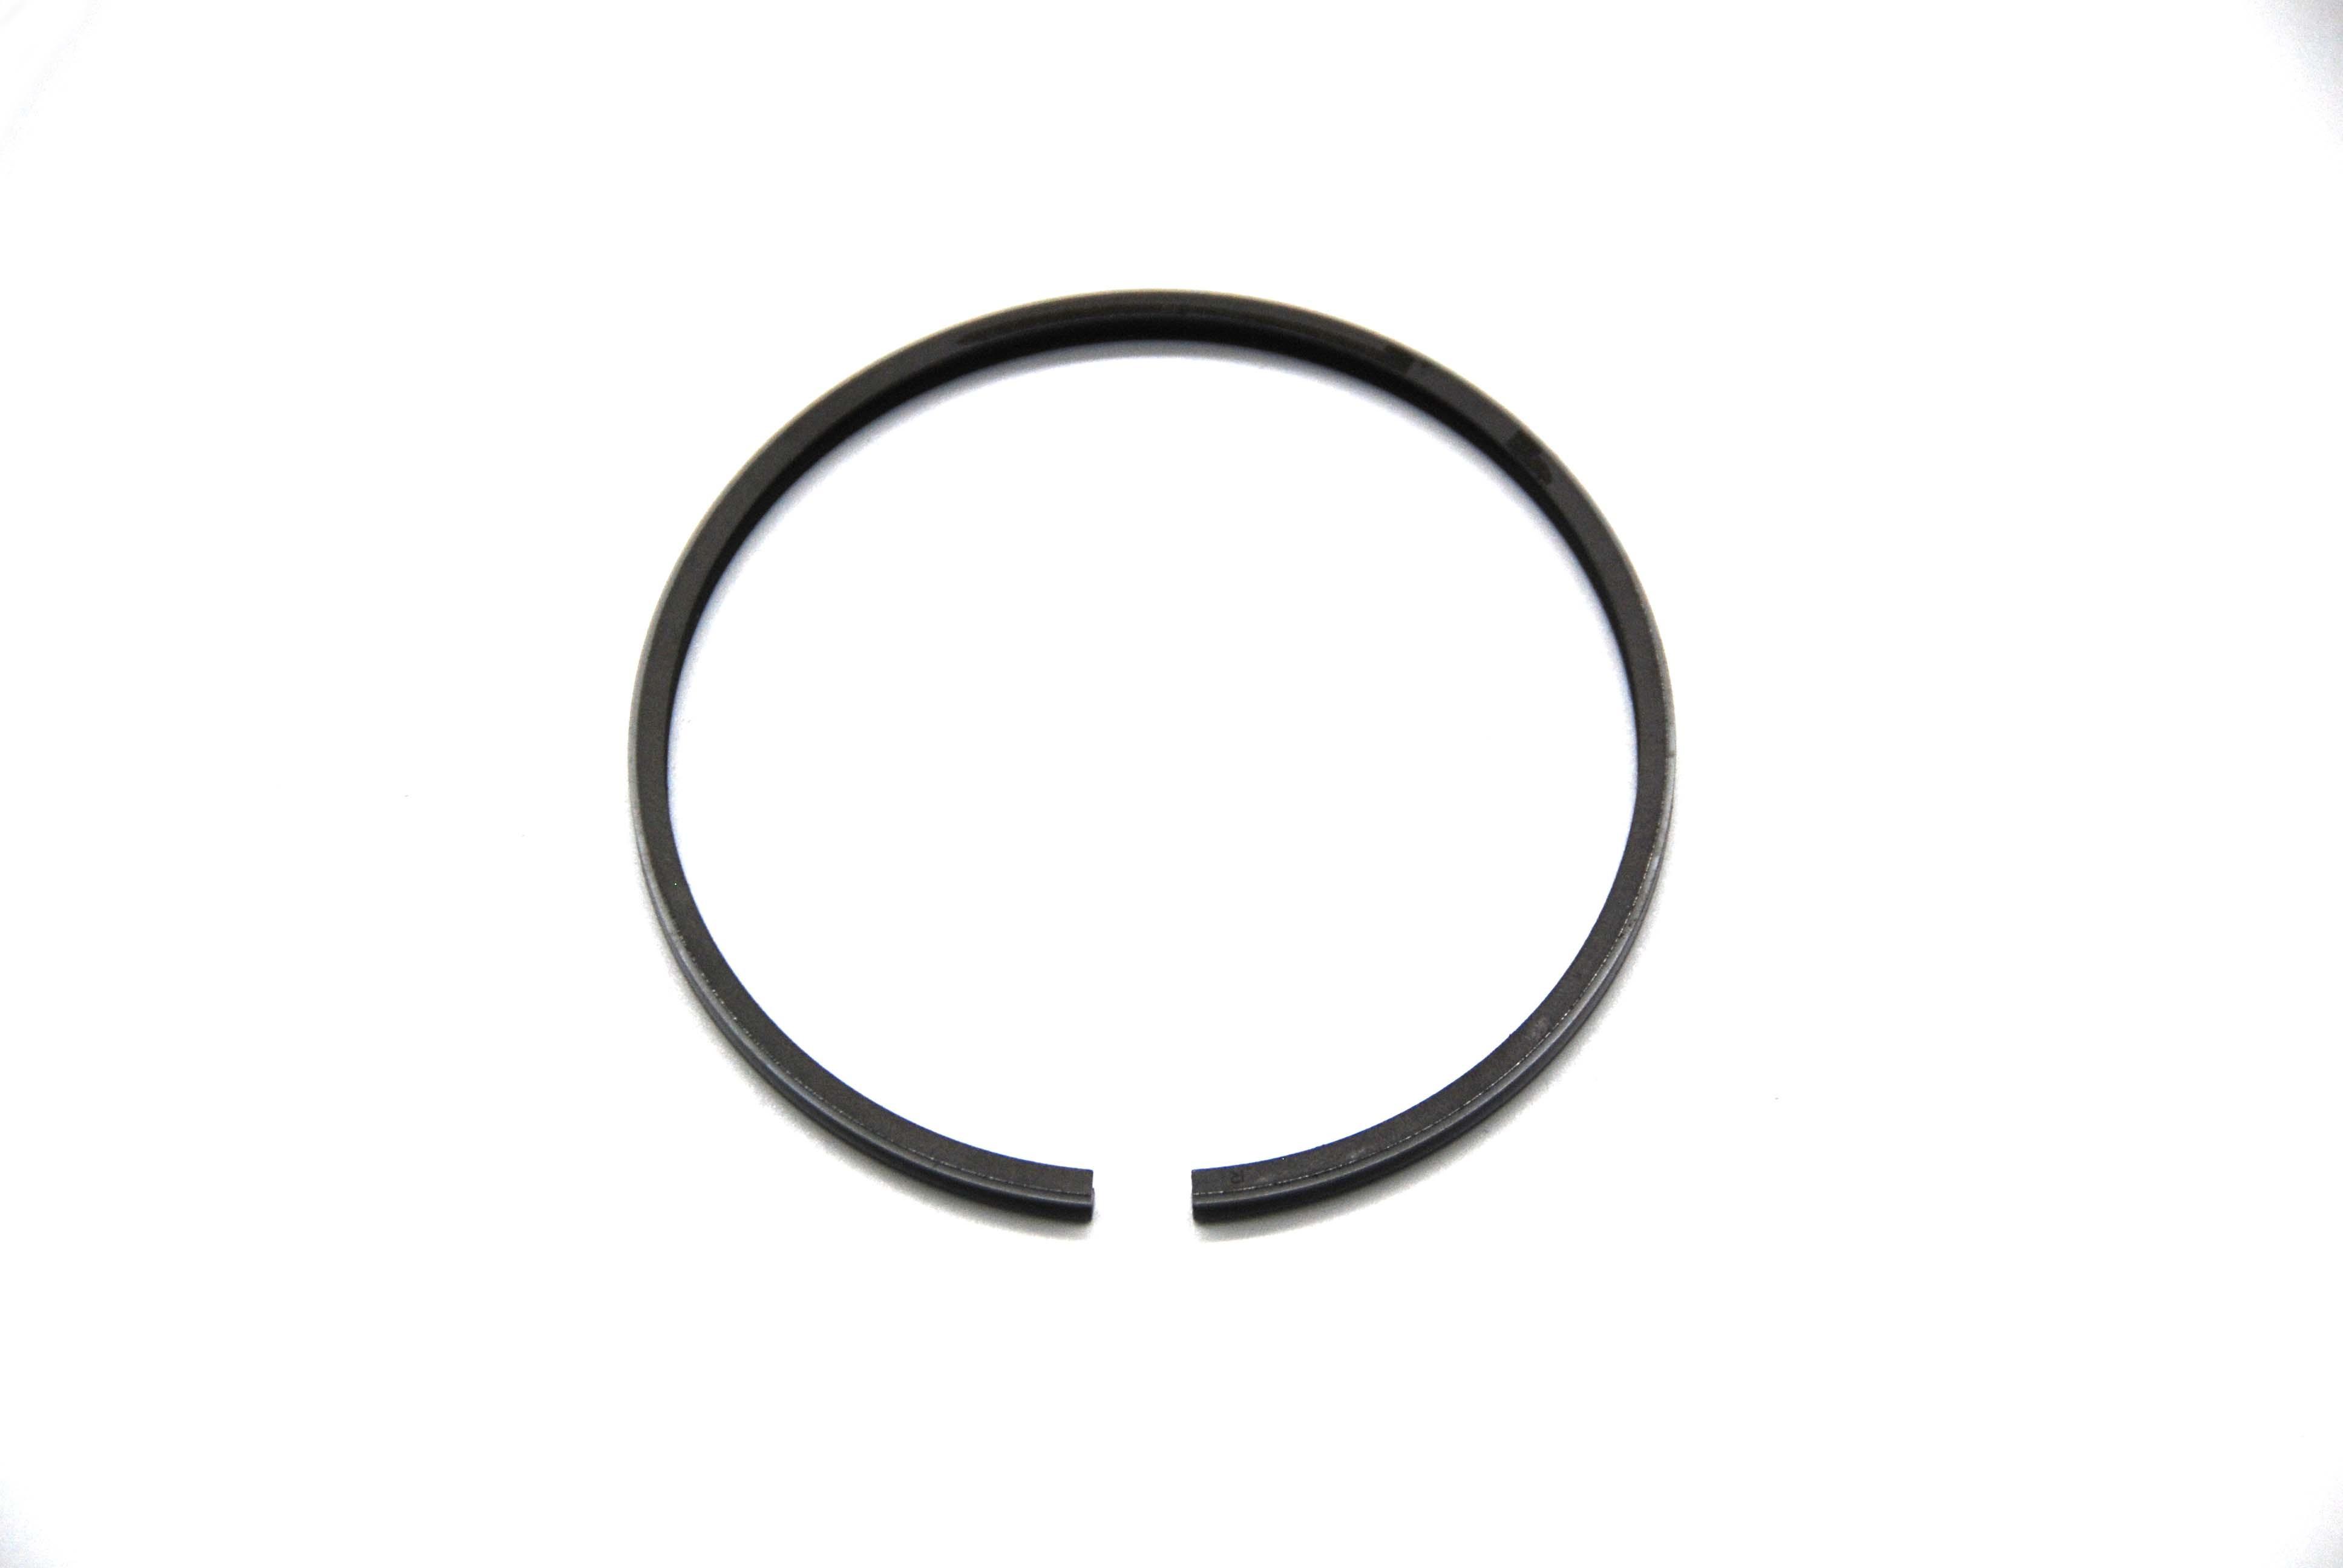 1a021-21092 Assy Ring Piston